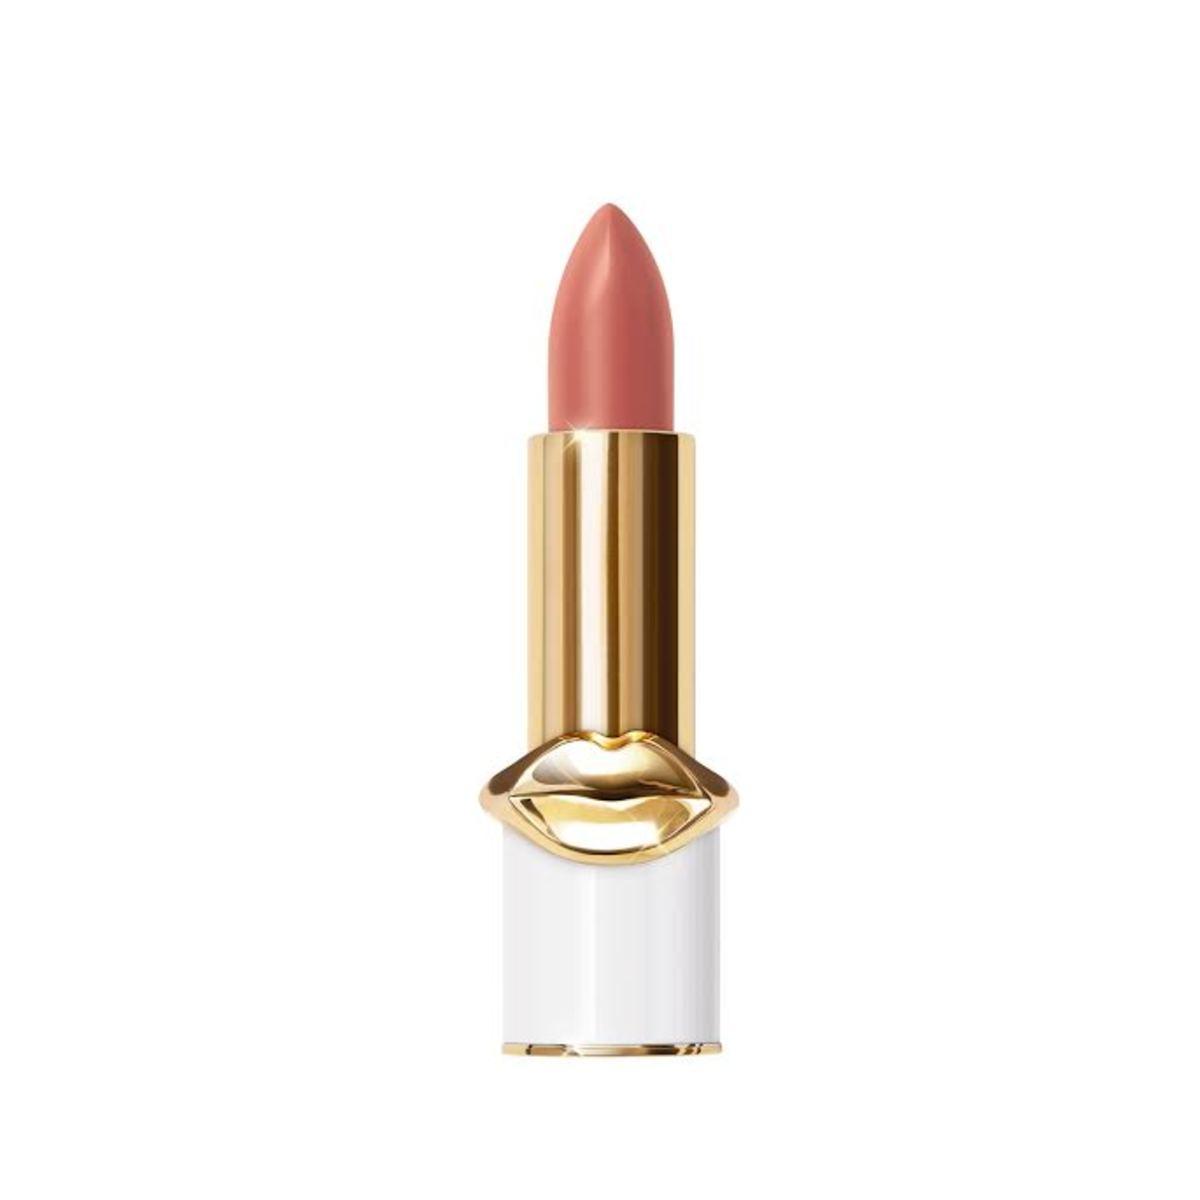 Pat McGrath Labs Lip Fetish Lip Balm, $38, available here.